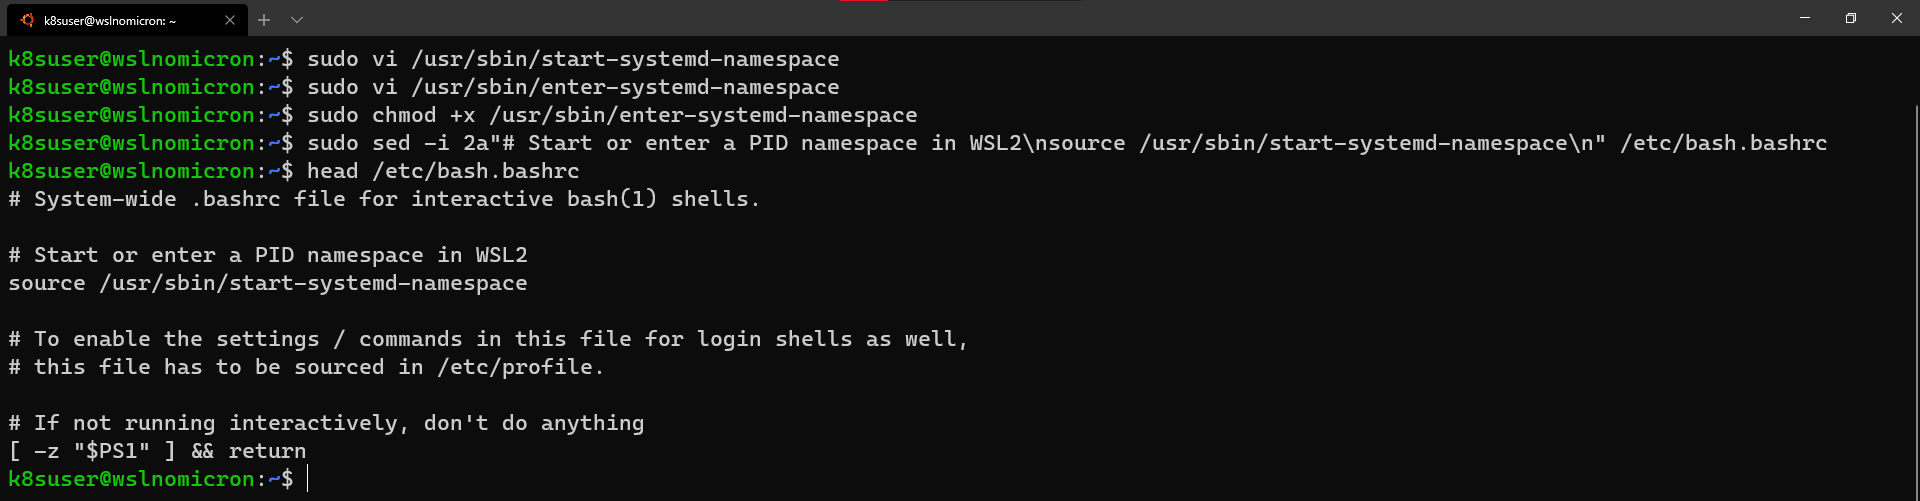 minikube-systemd-files